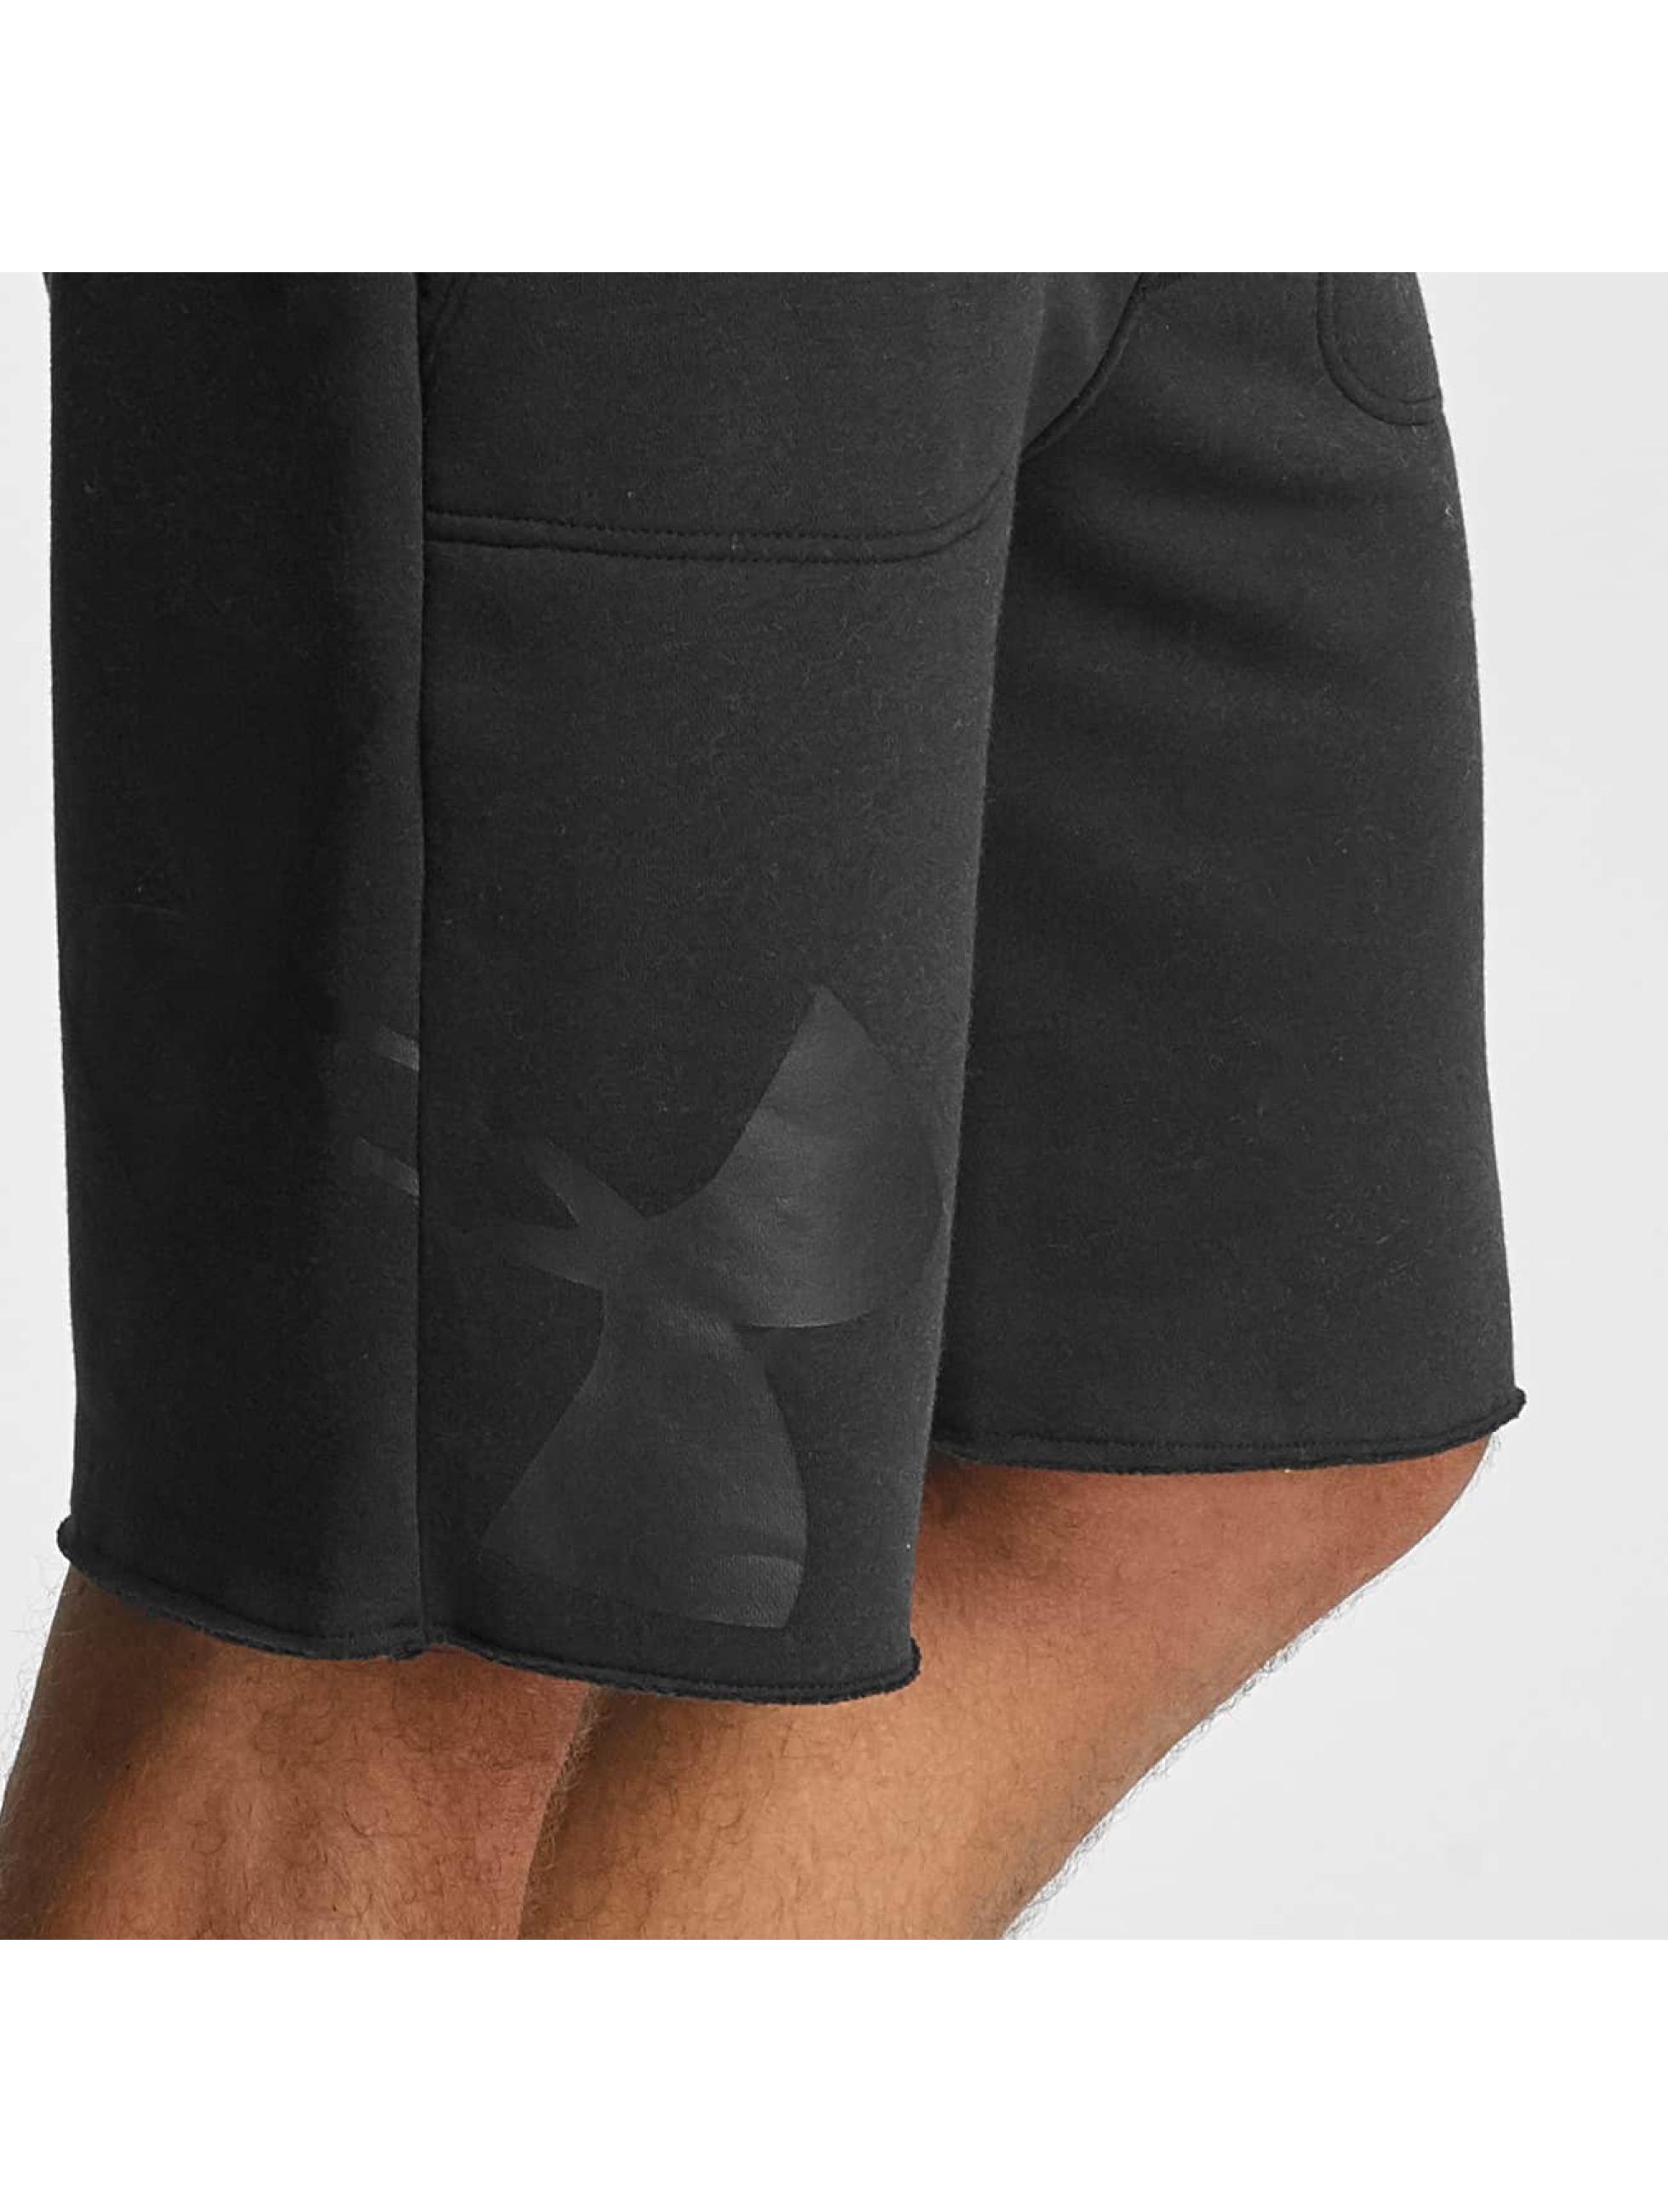 Under Armour Shorts Rival schwarz